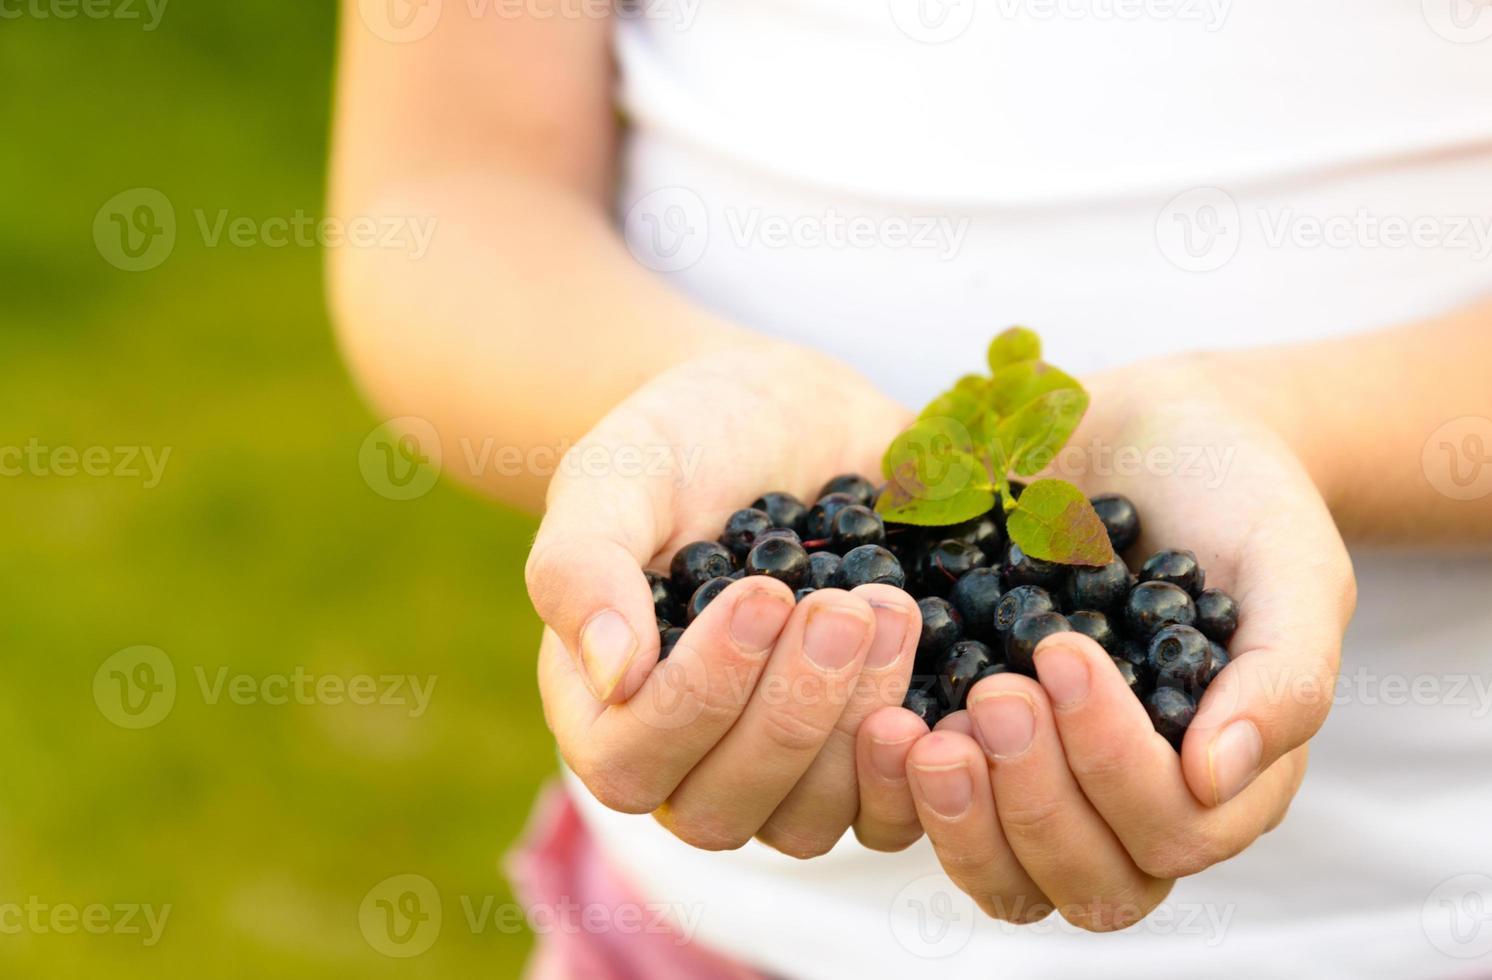 Hands holding fresh blueberries photo